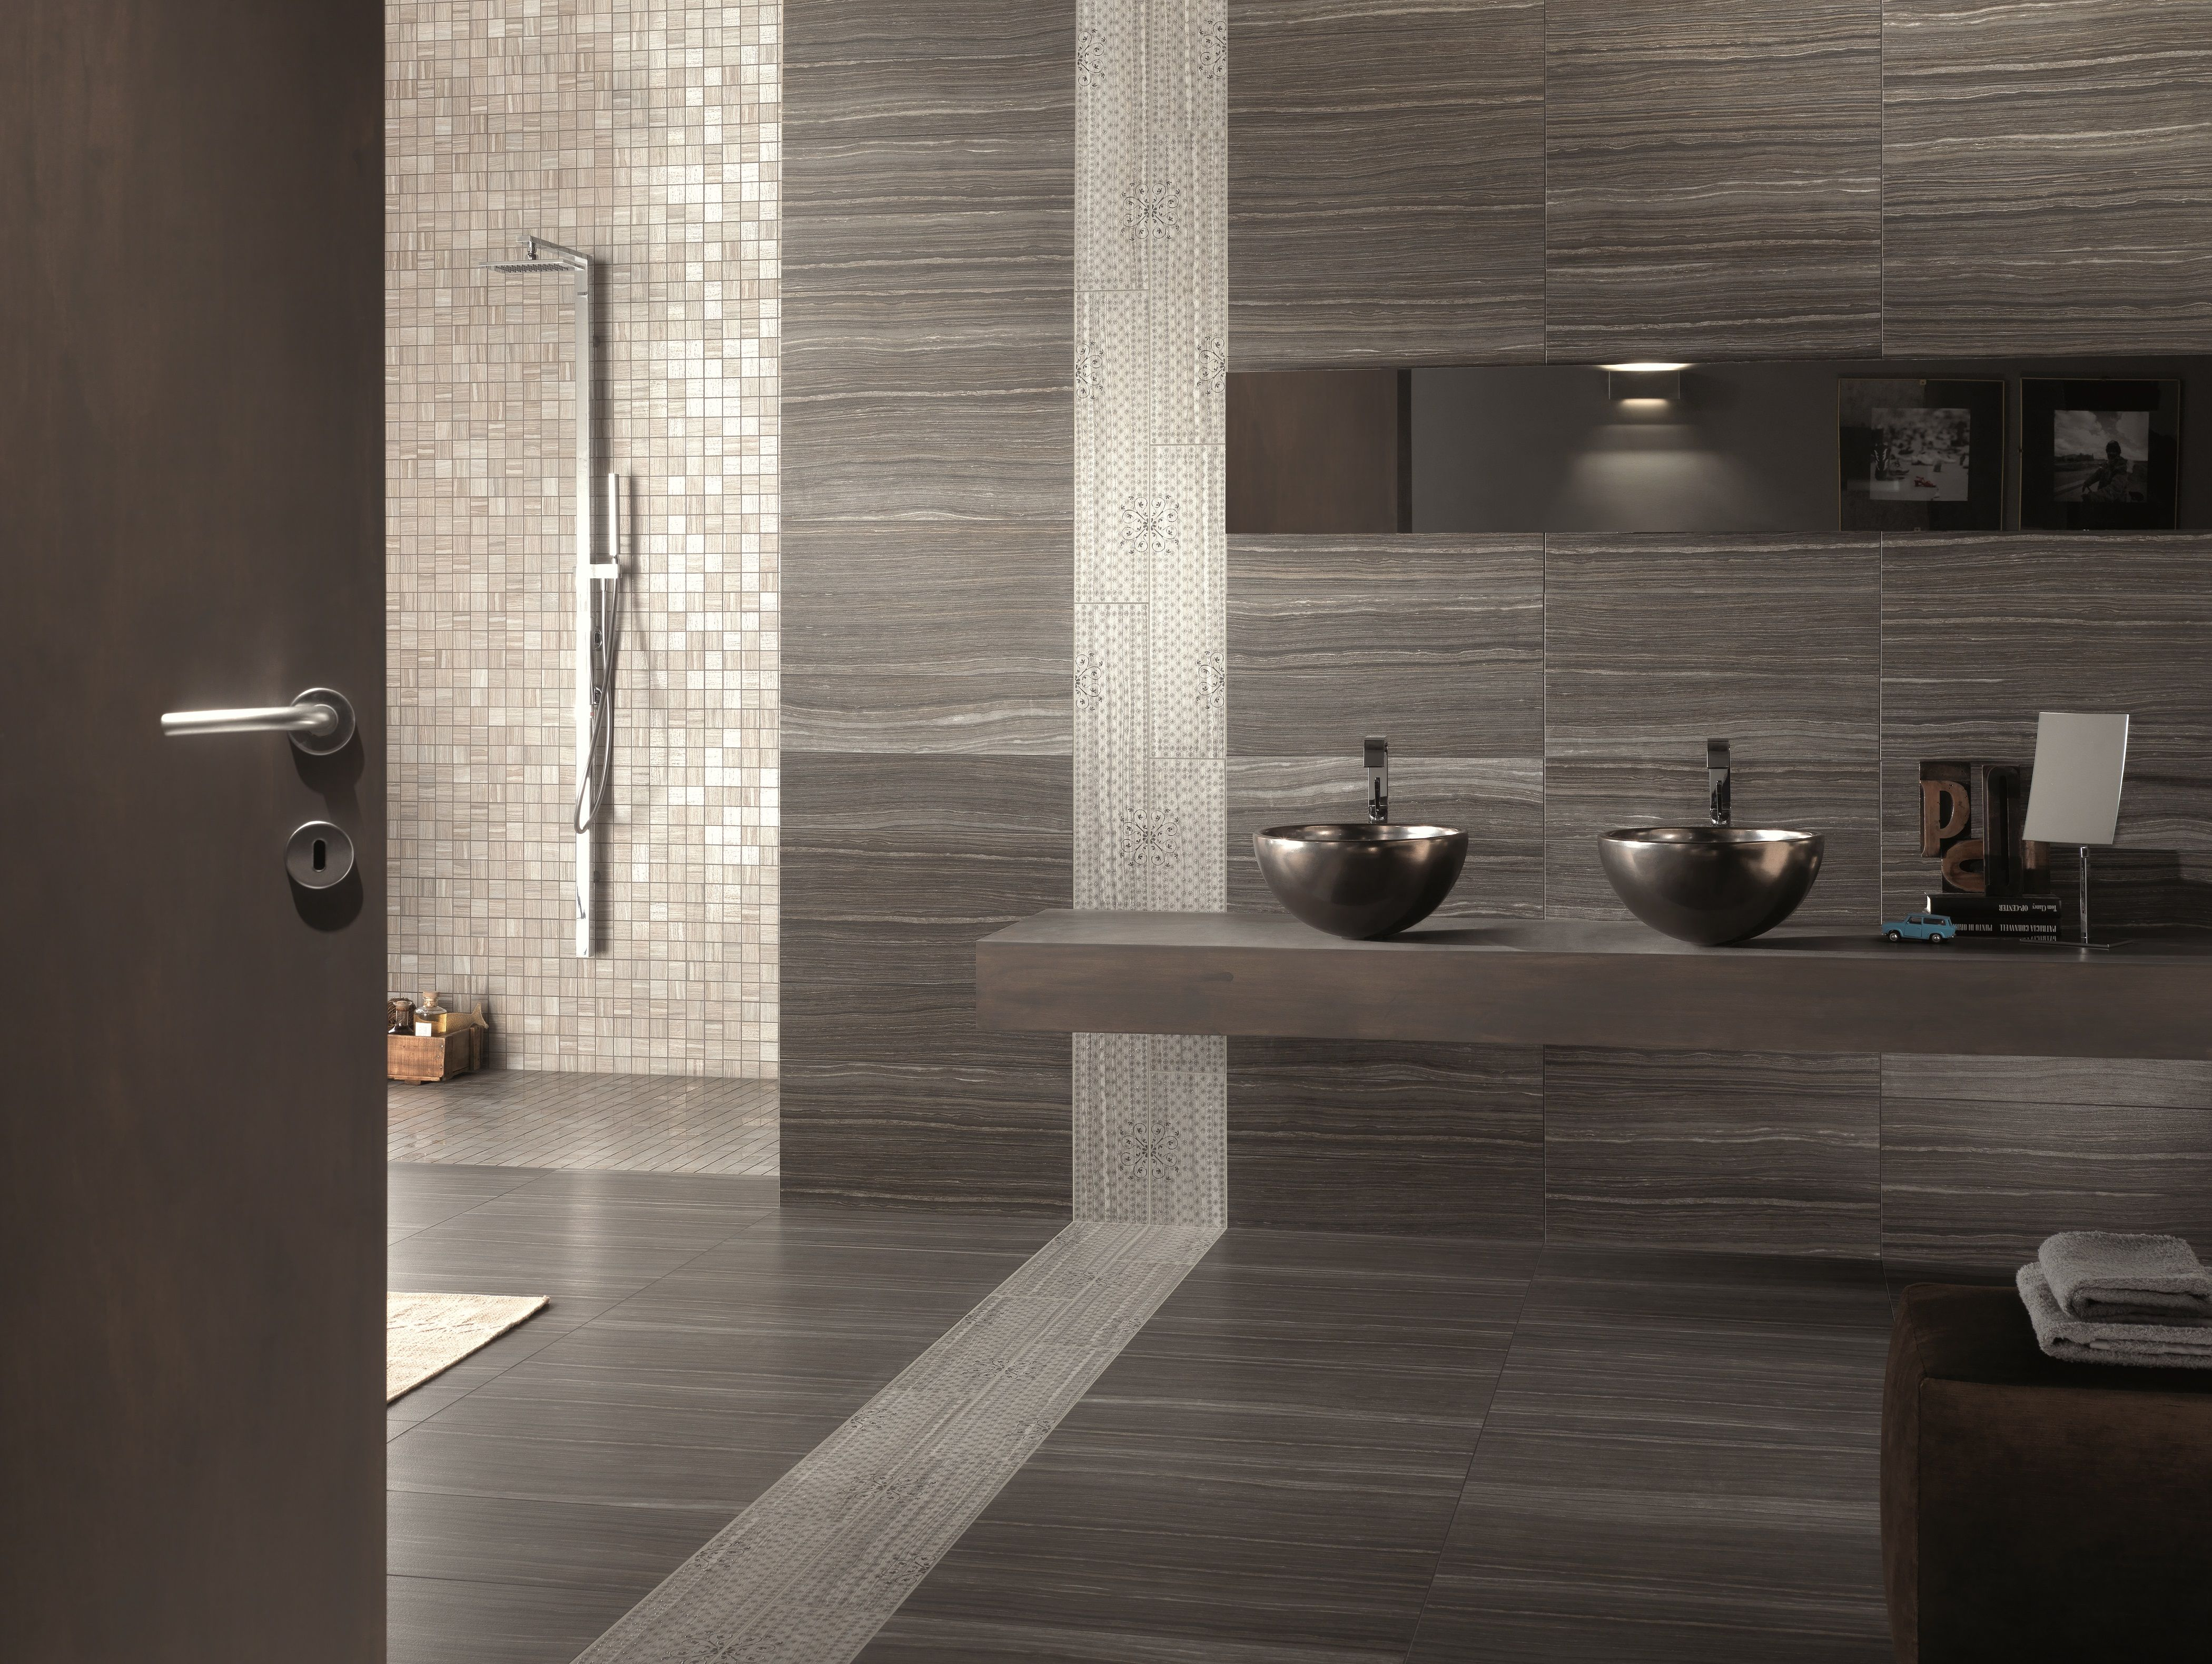 Pin By Floor Decor On Industrial Style Modern Bathroom Tile